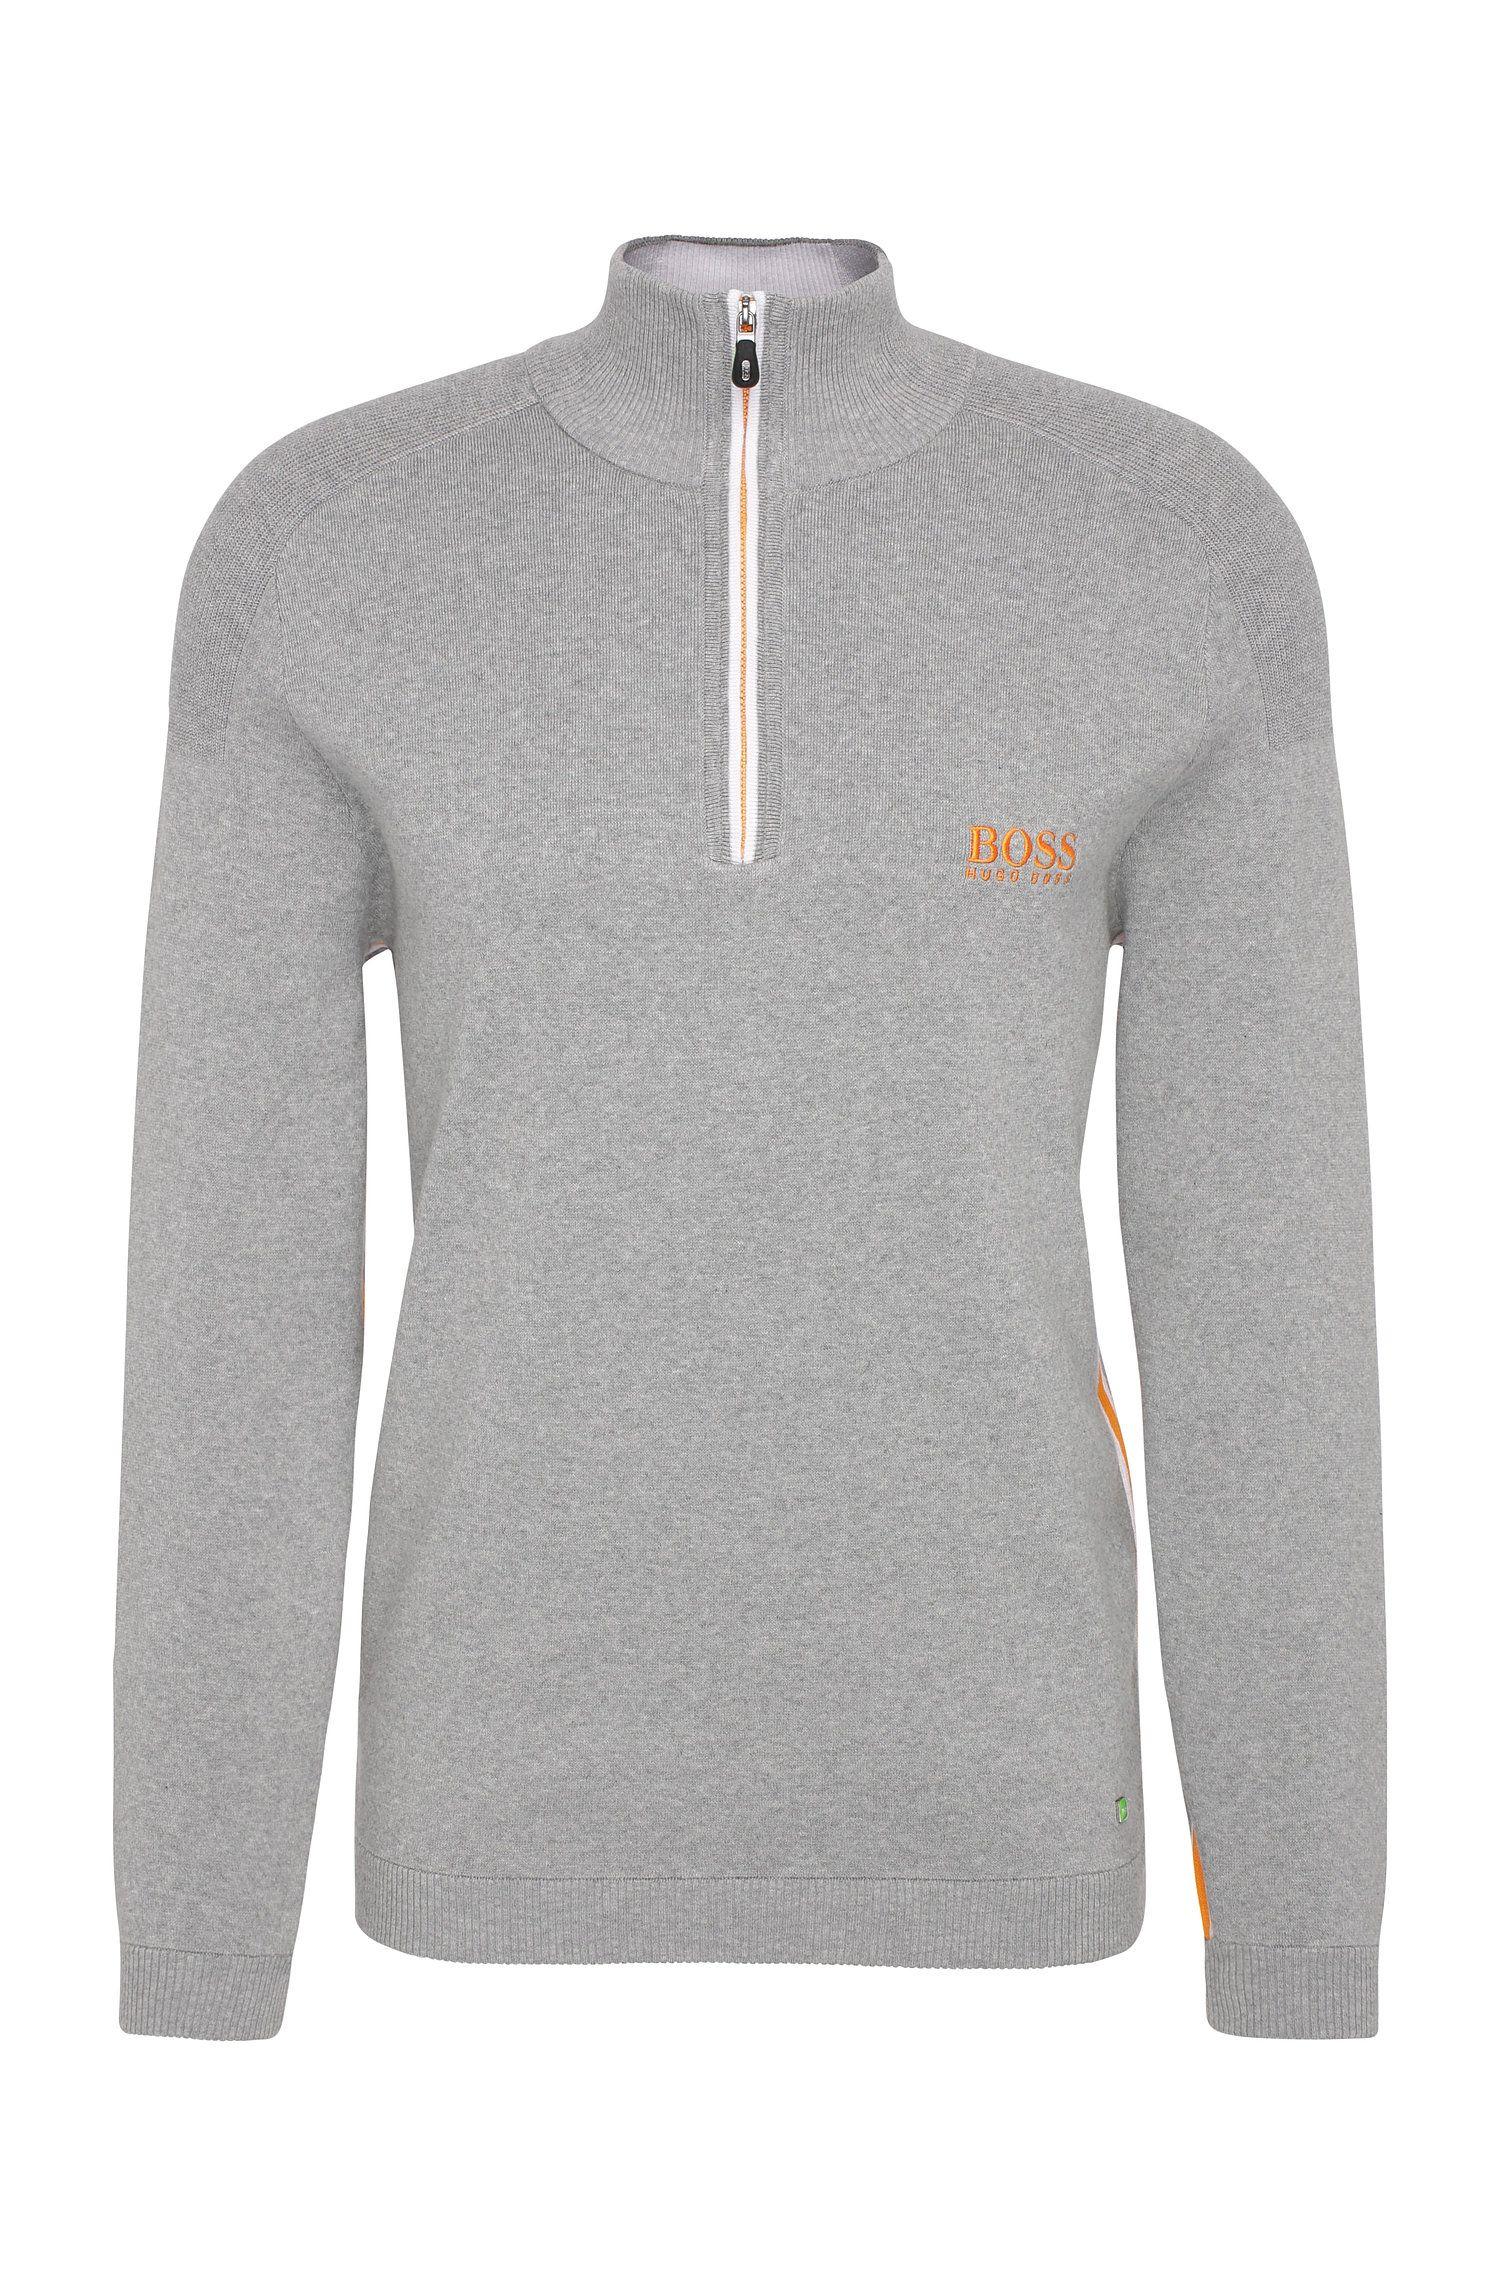 Stretch Cotton Water Repellent Troyer Sweater | Zayo MK SR17